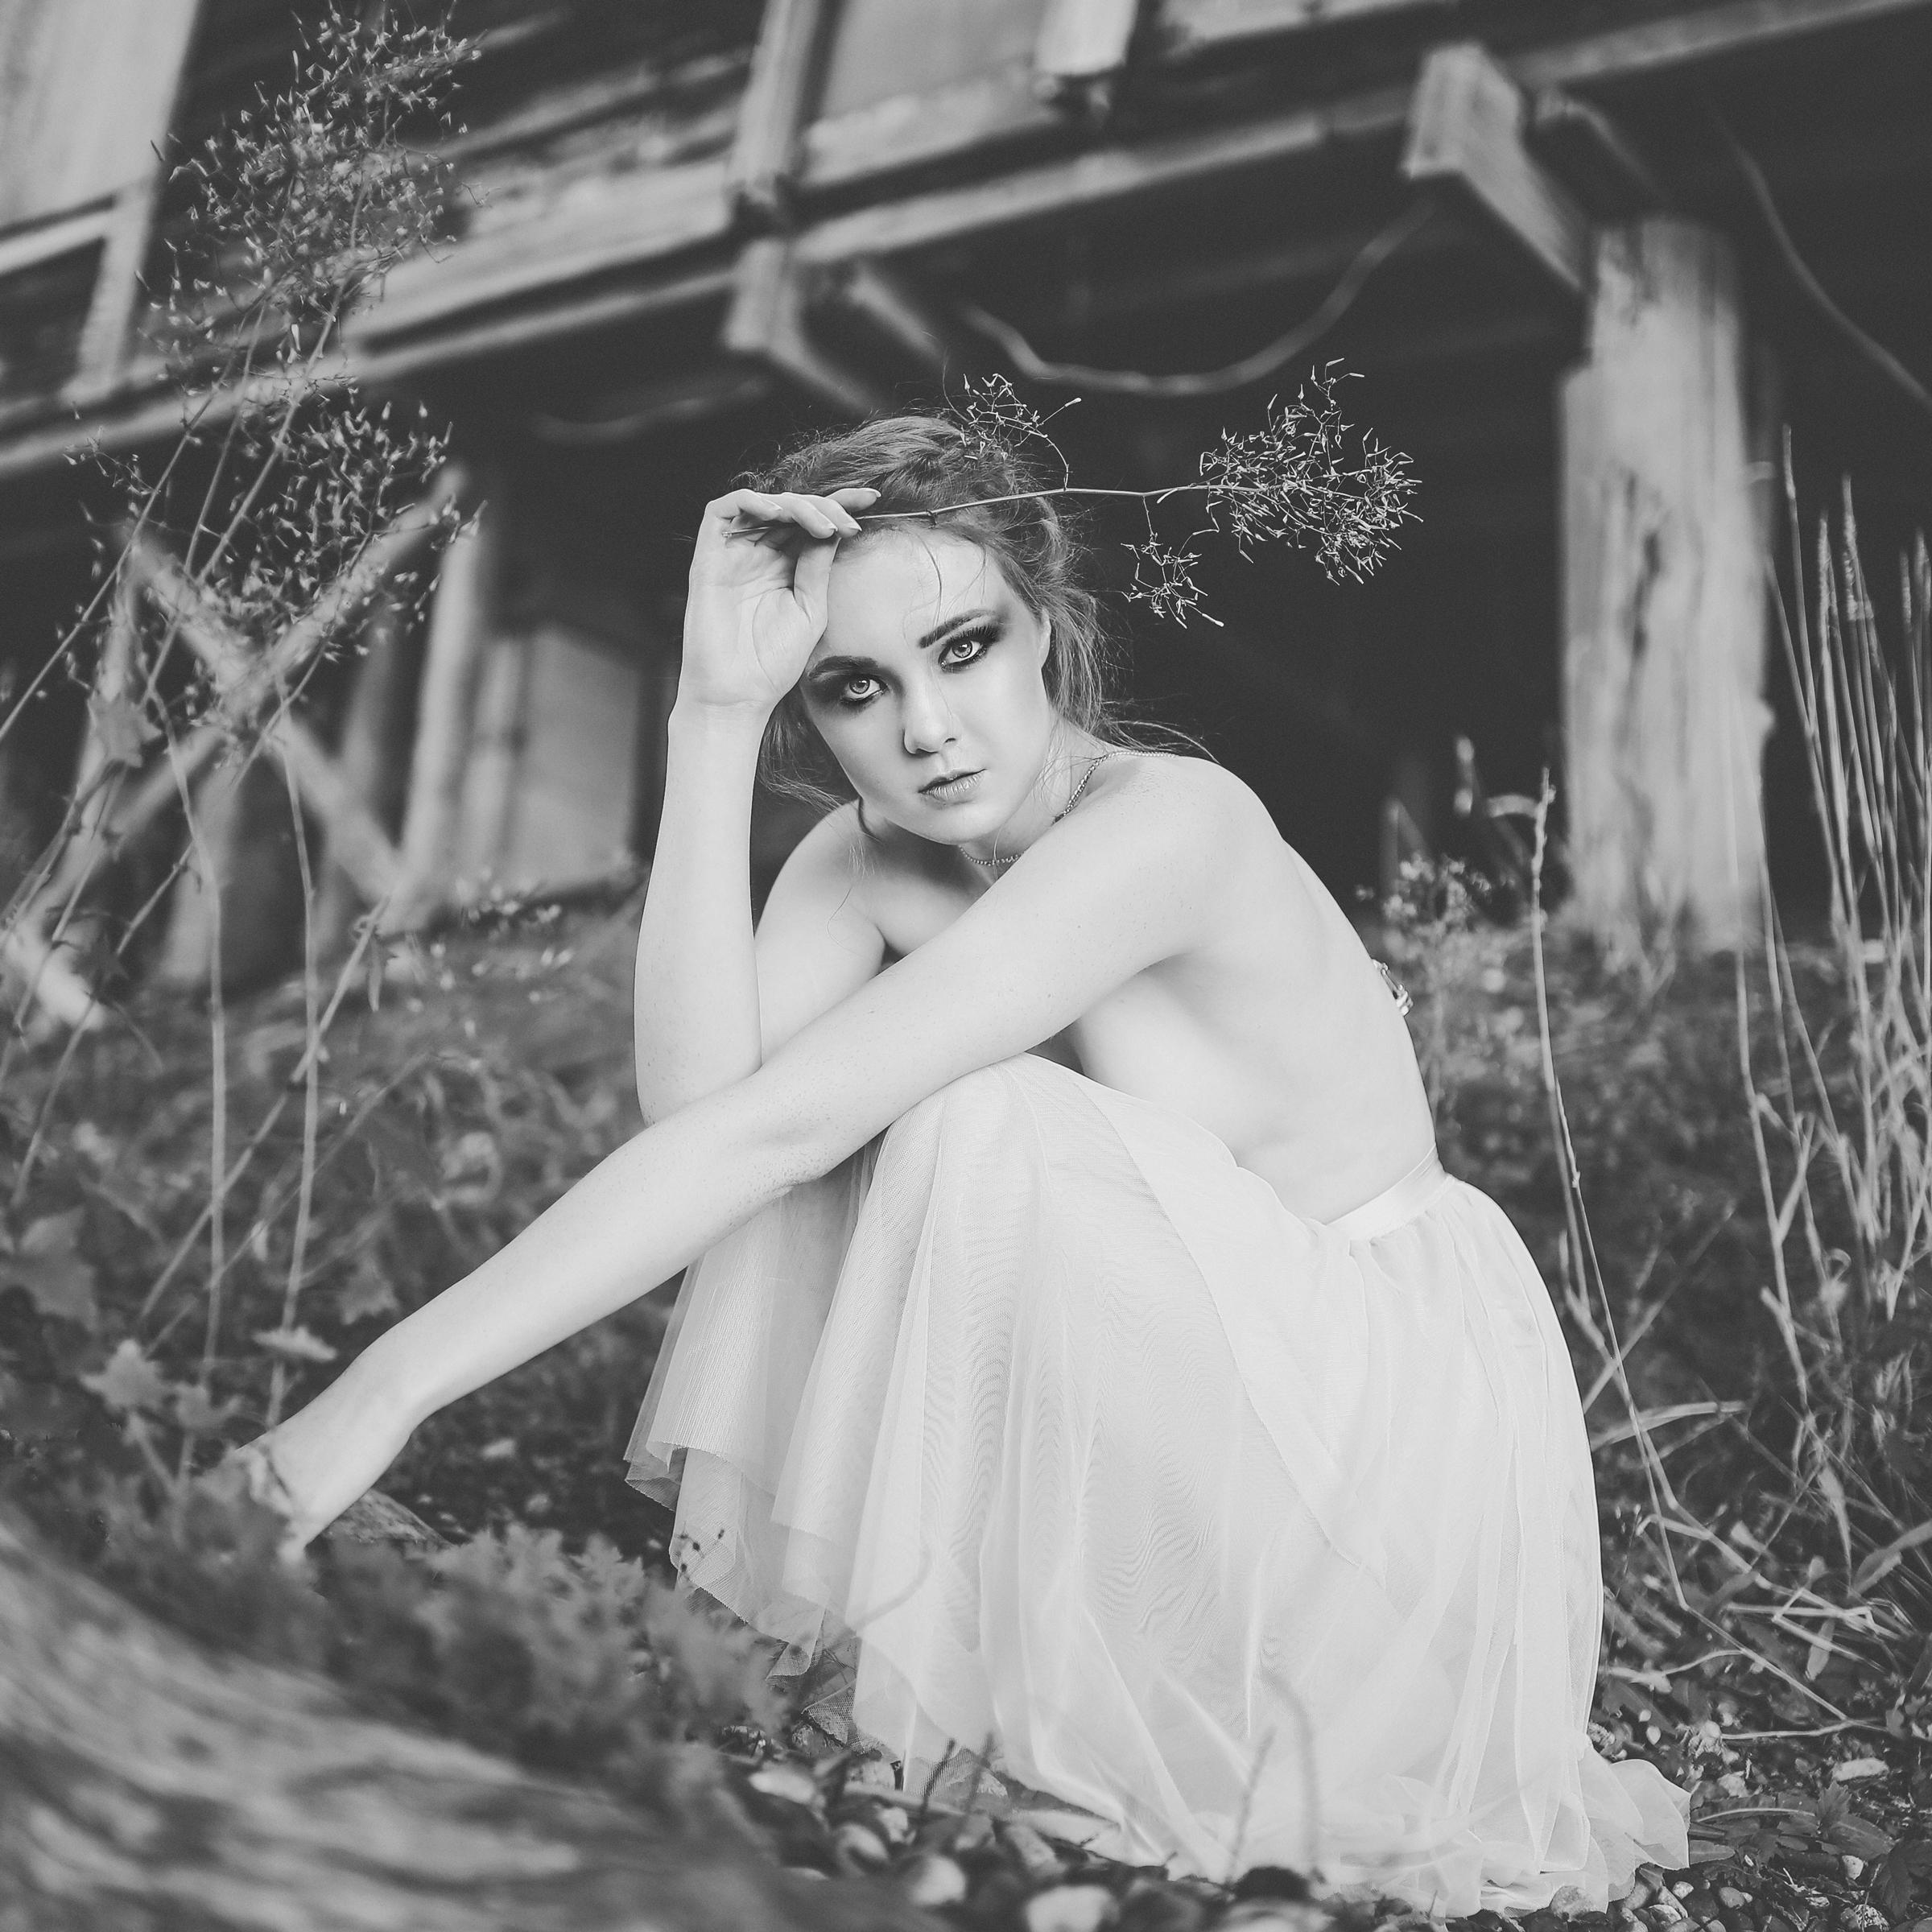 black and white portrait, fashion editorial, jennifer picard photography, vancouver fashion photographer